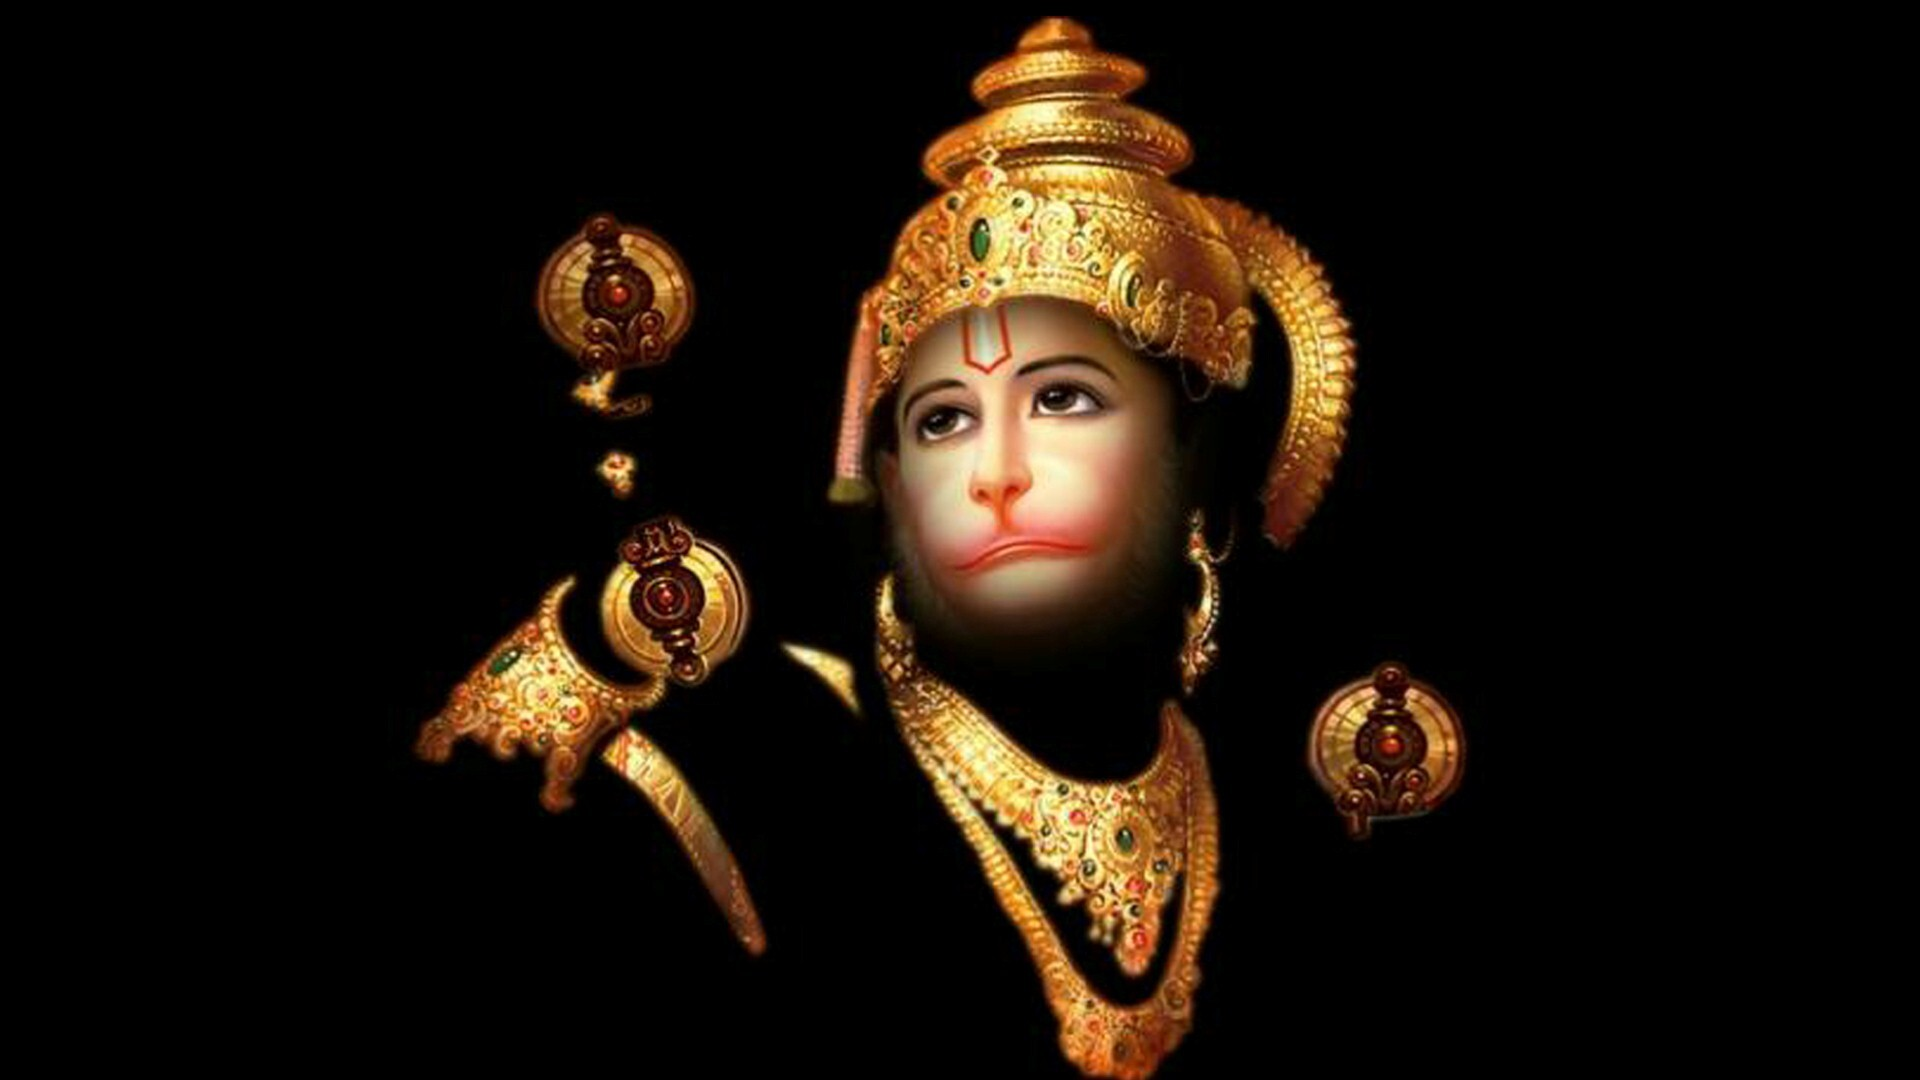 lord hanuman wallpaper hd wallpapers